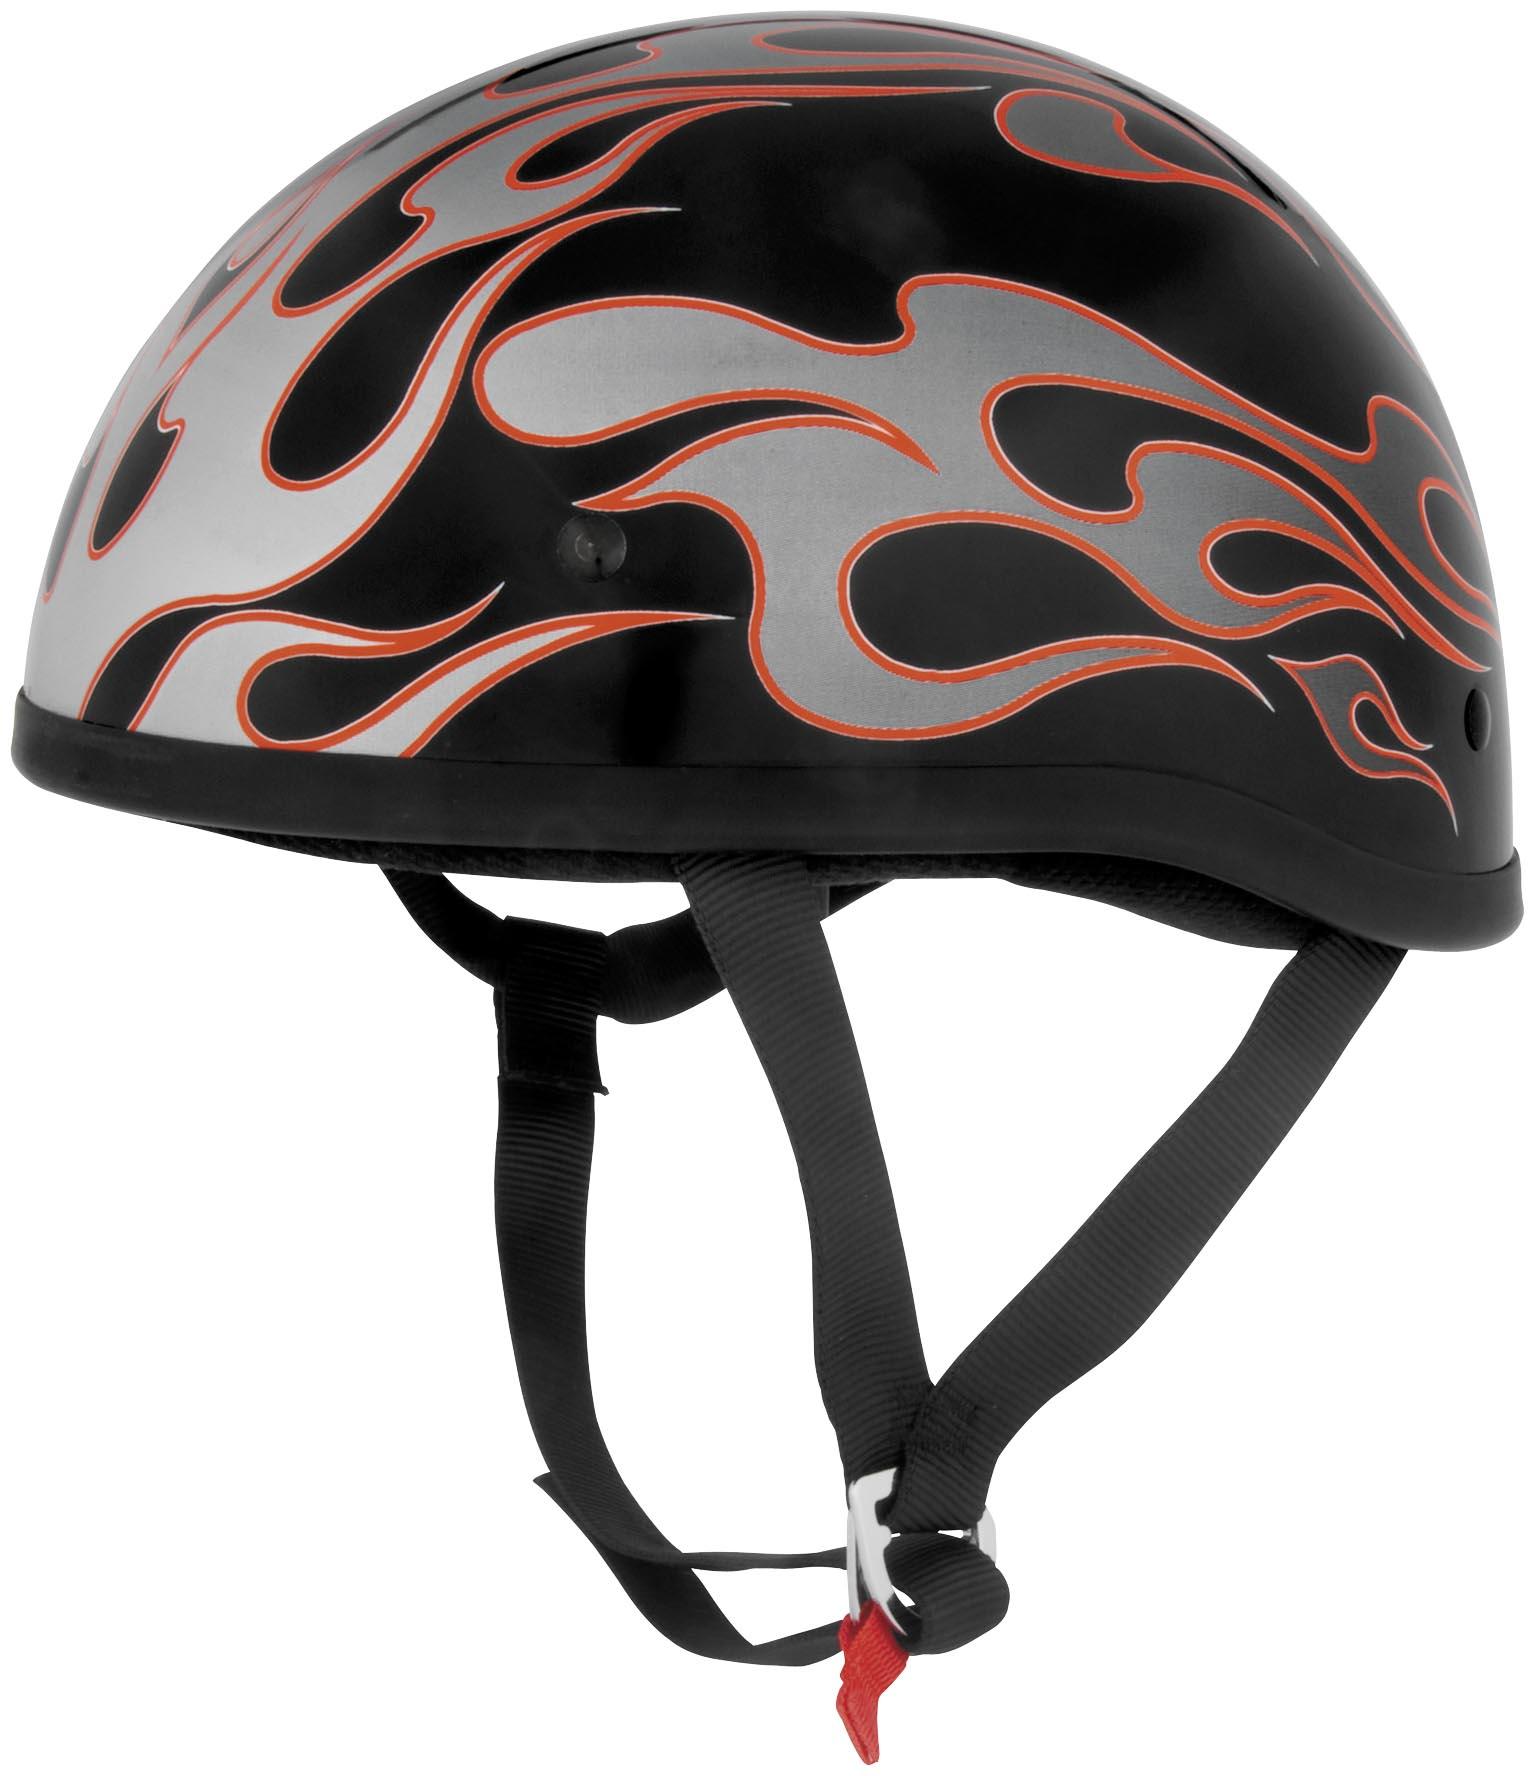 Original Flames Graphics Helmet